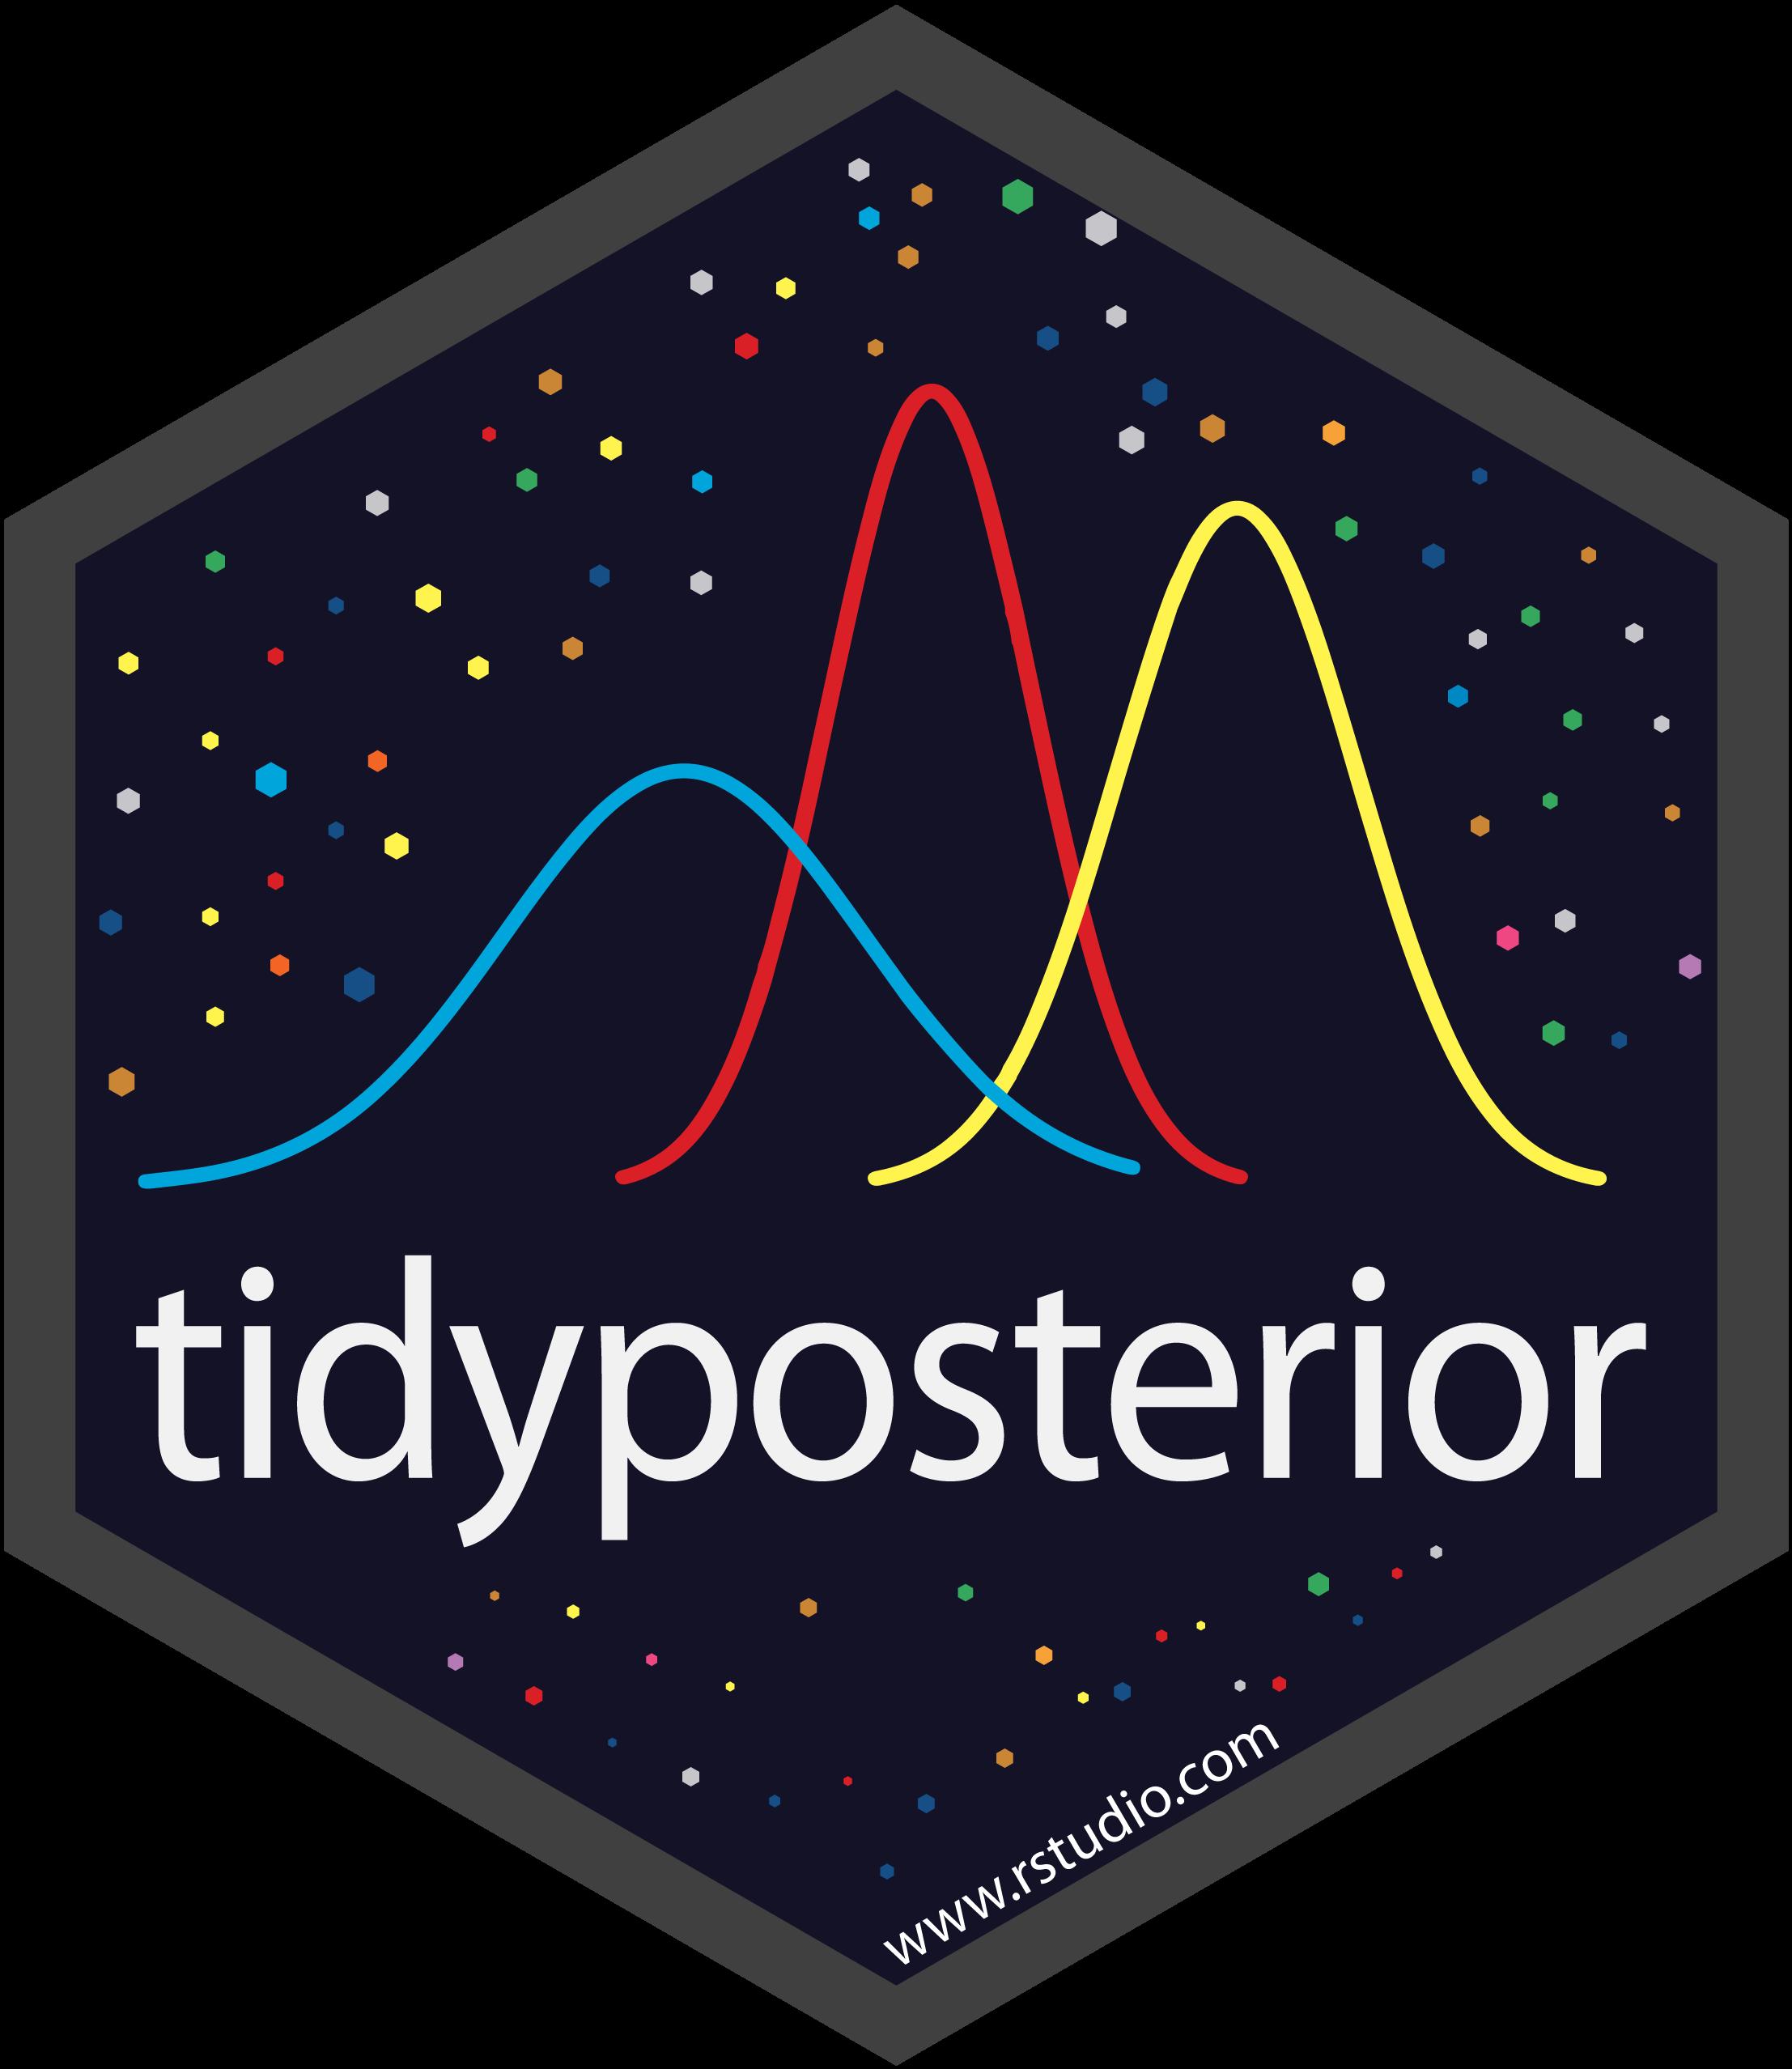 tidyposterior